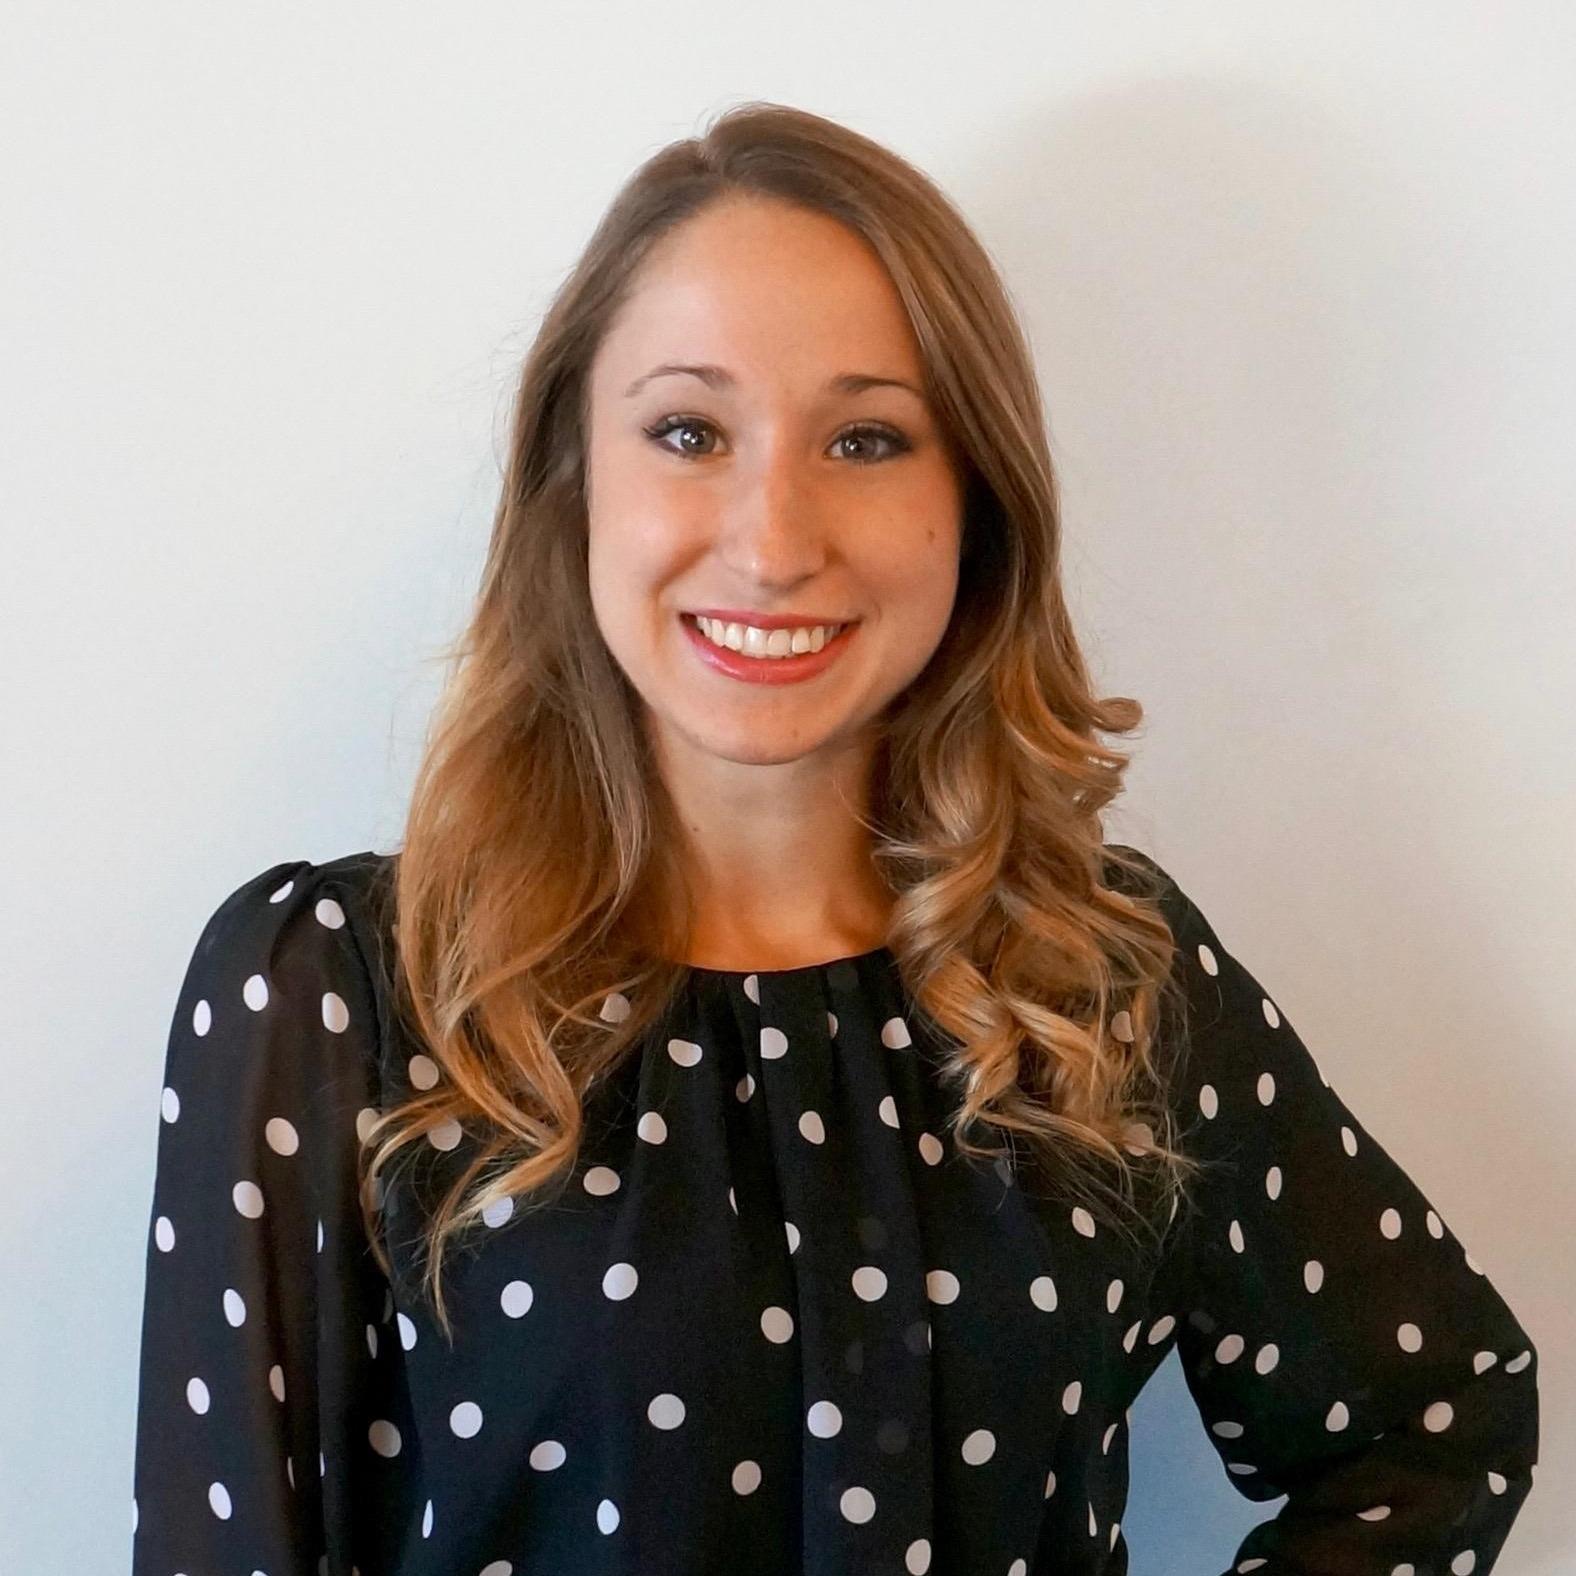 Corinne Miller, Assistant Planner